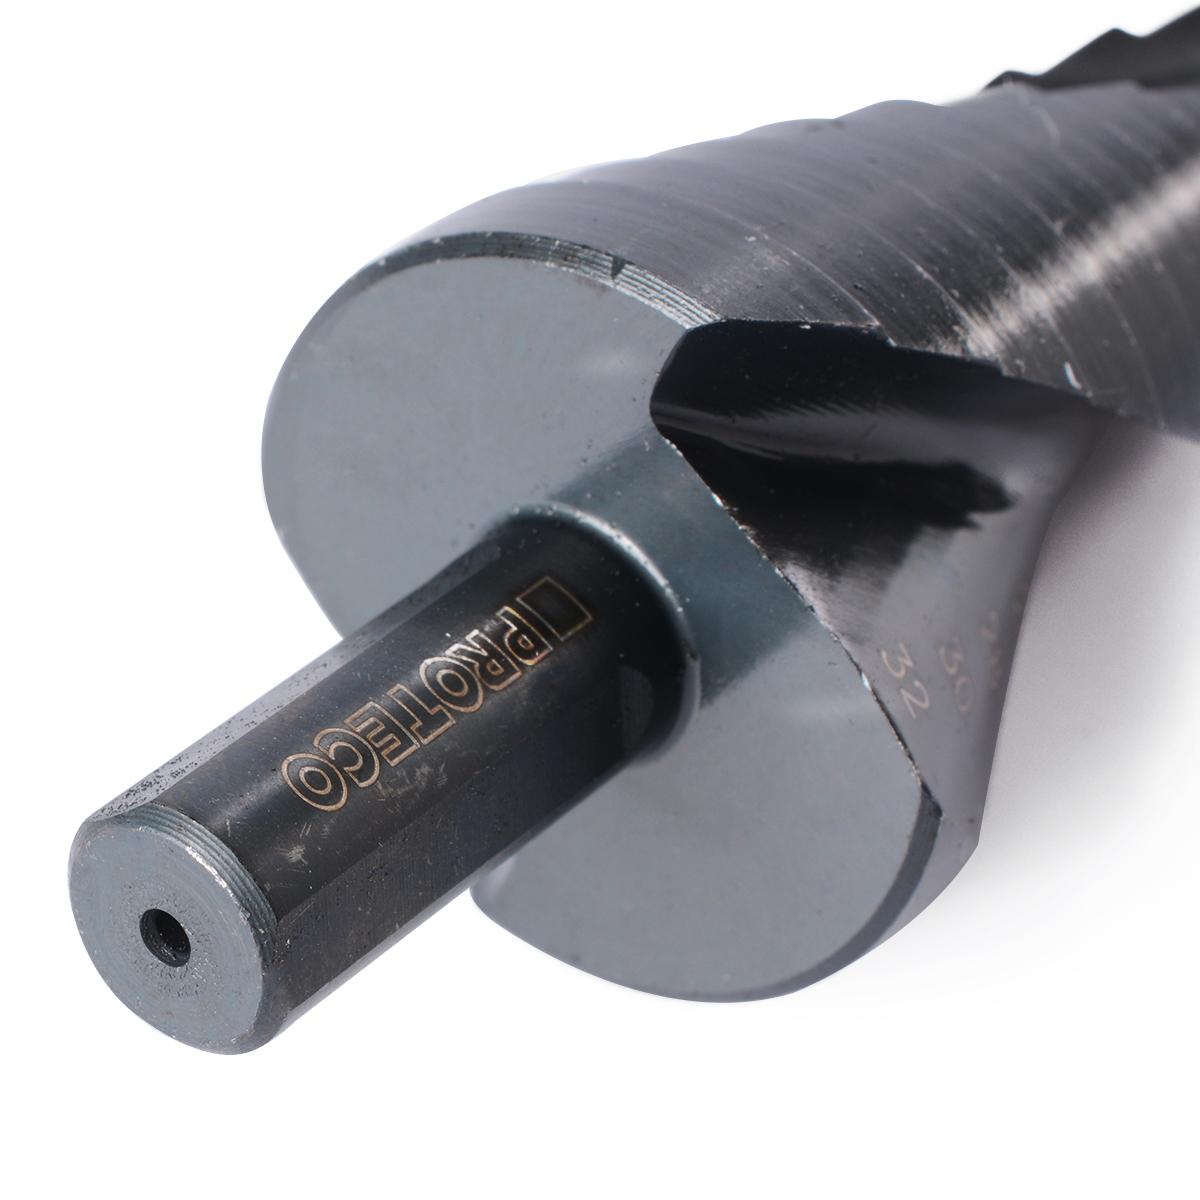 8 steps 4-32mm Nitriding Black Step Reamer Cone drill